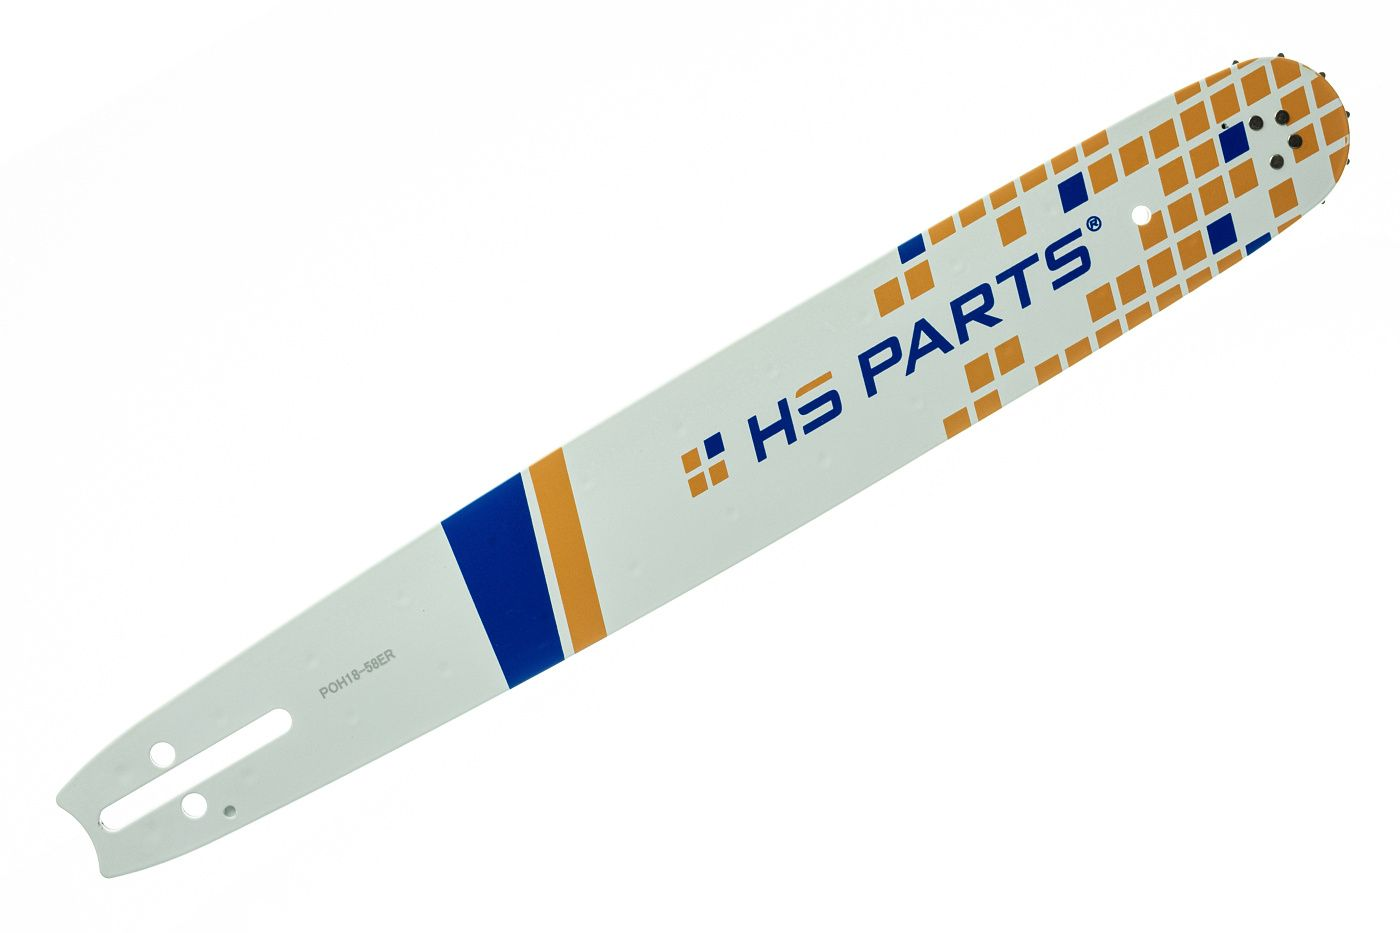 "HS PARTS Vodící lišta 18"" (45 cm) 3/8"" .058"" (1,5 mm) 64 čl."